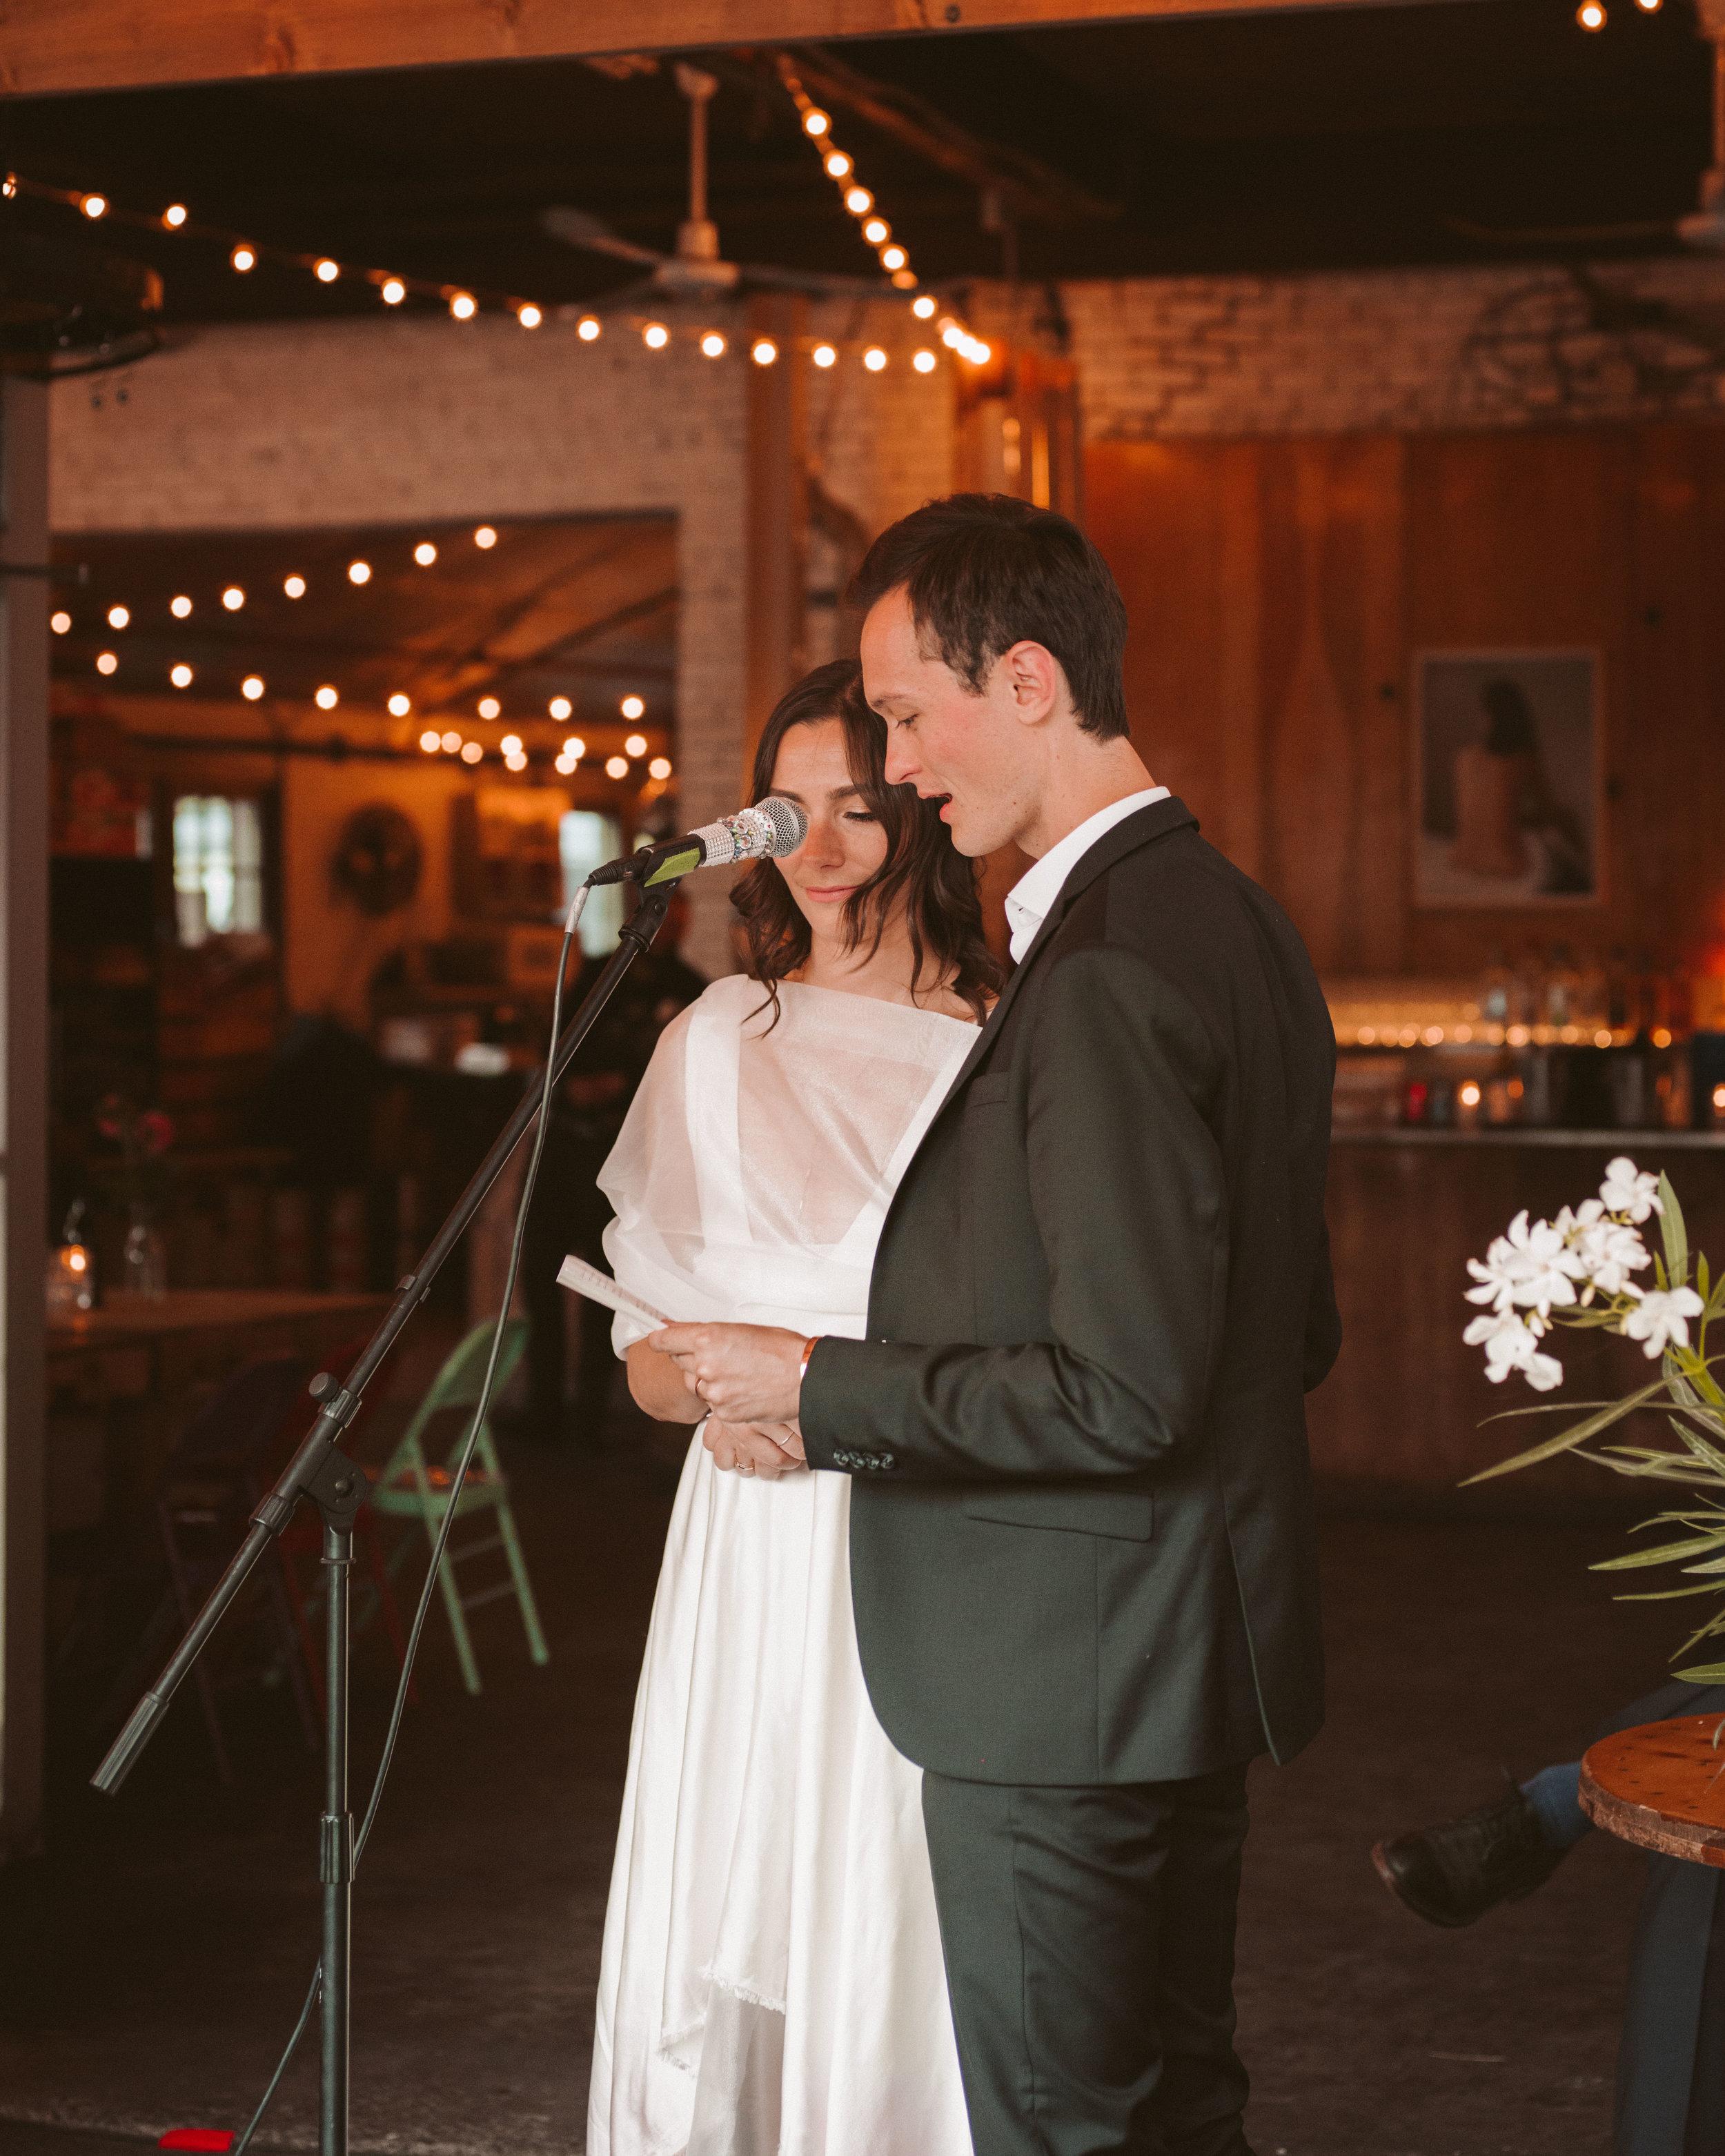 Tim-Darcy_Amy-Fort_Wedding_2019-9983.jpg